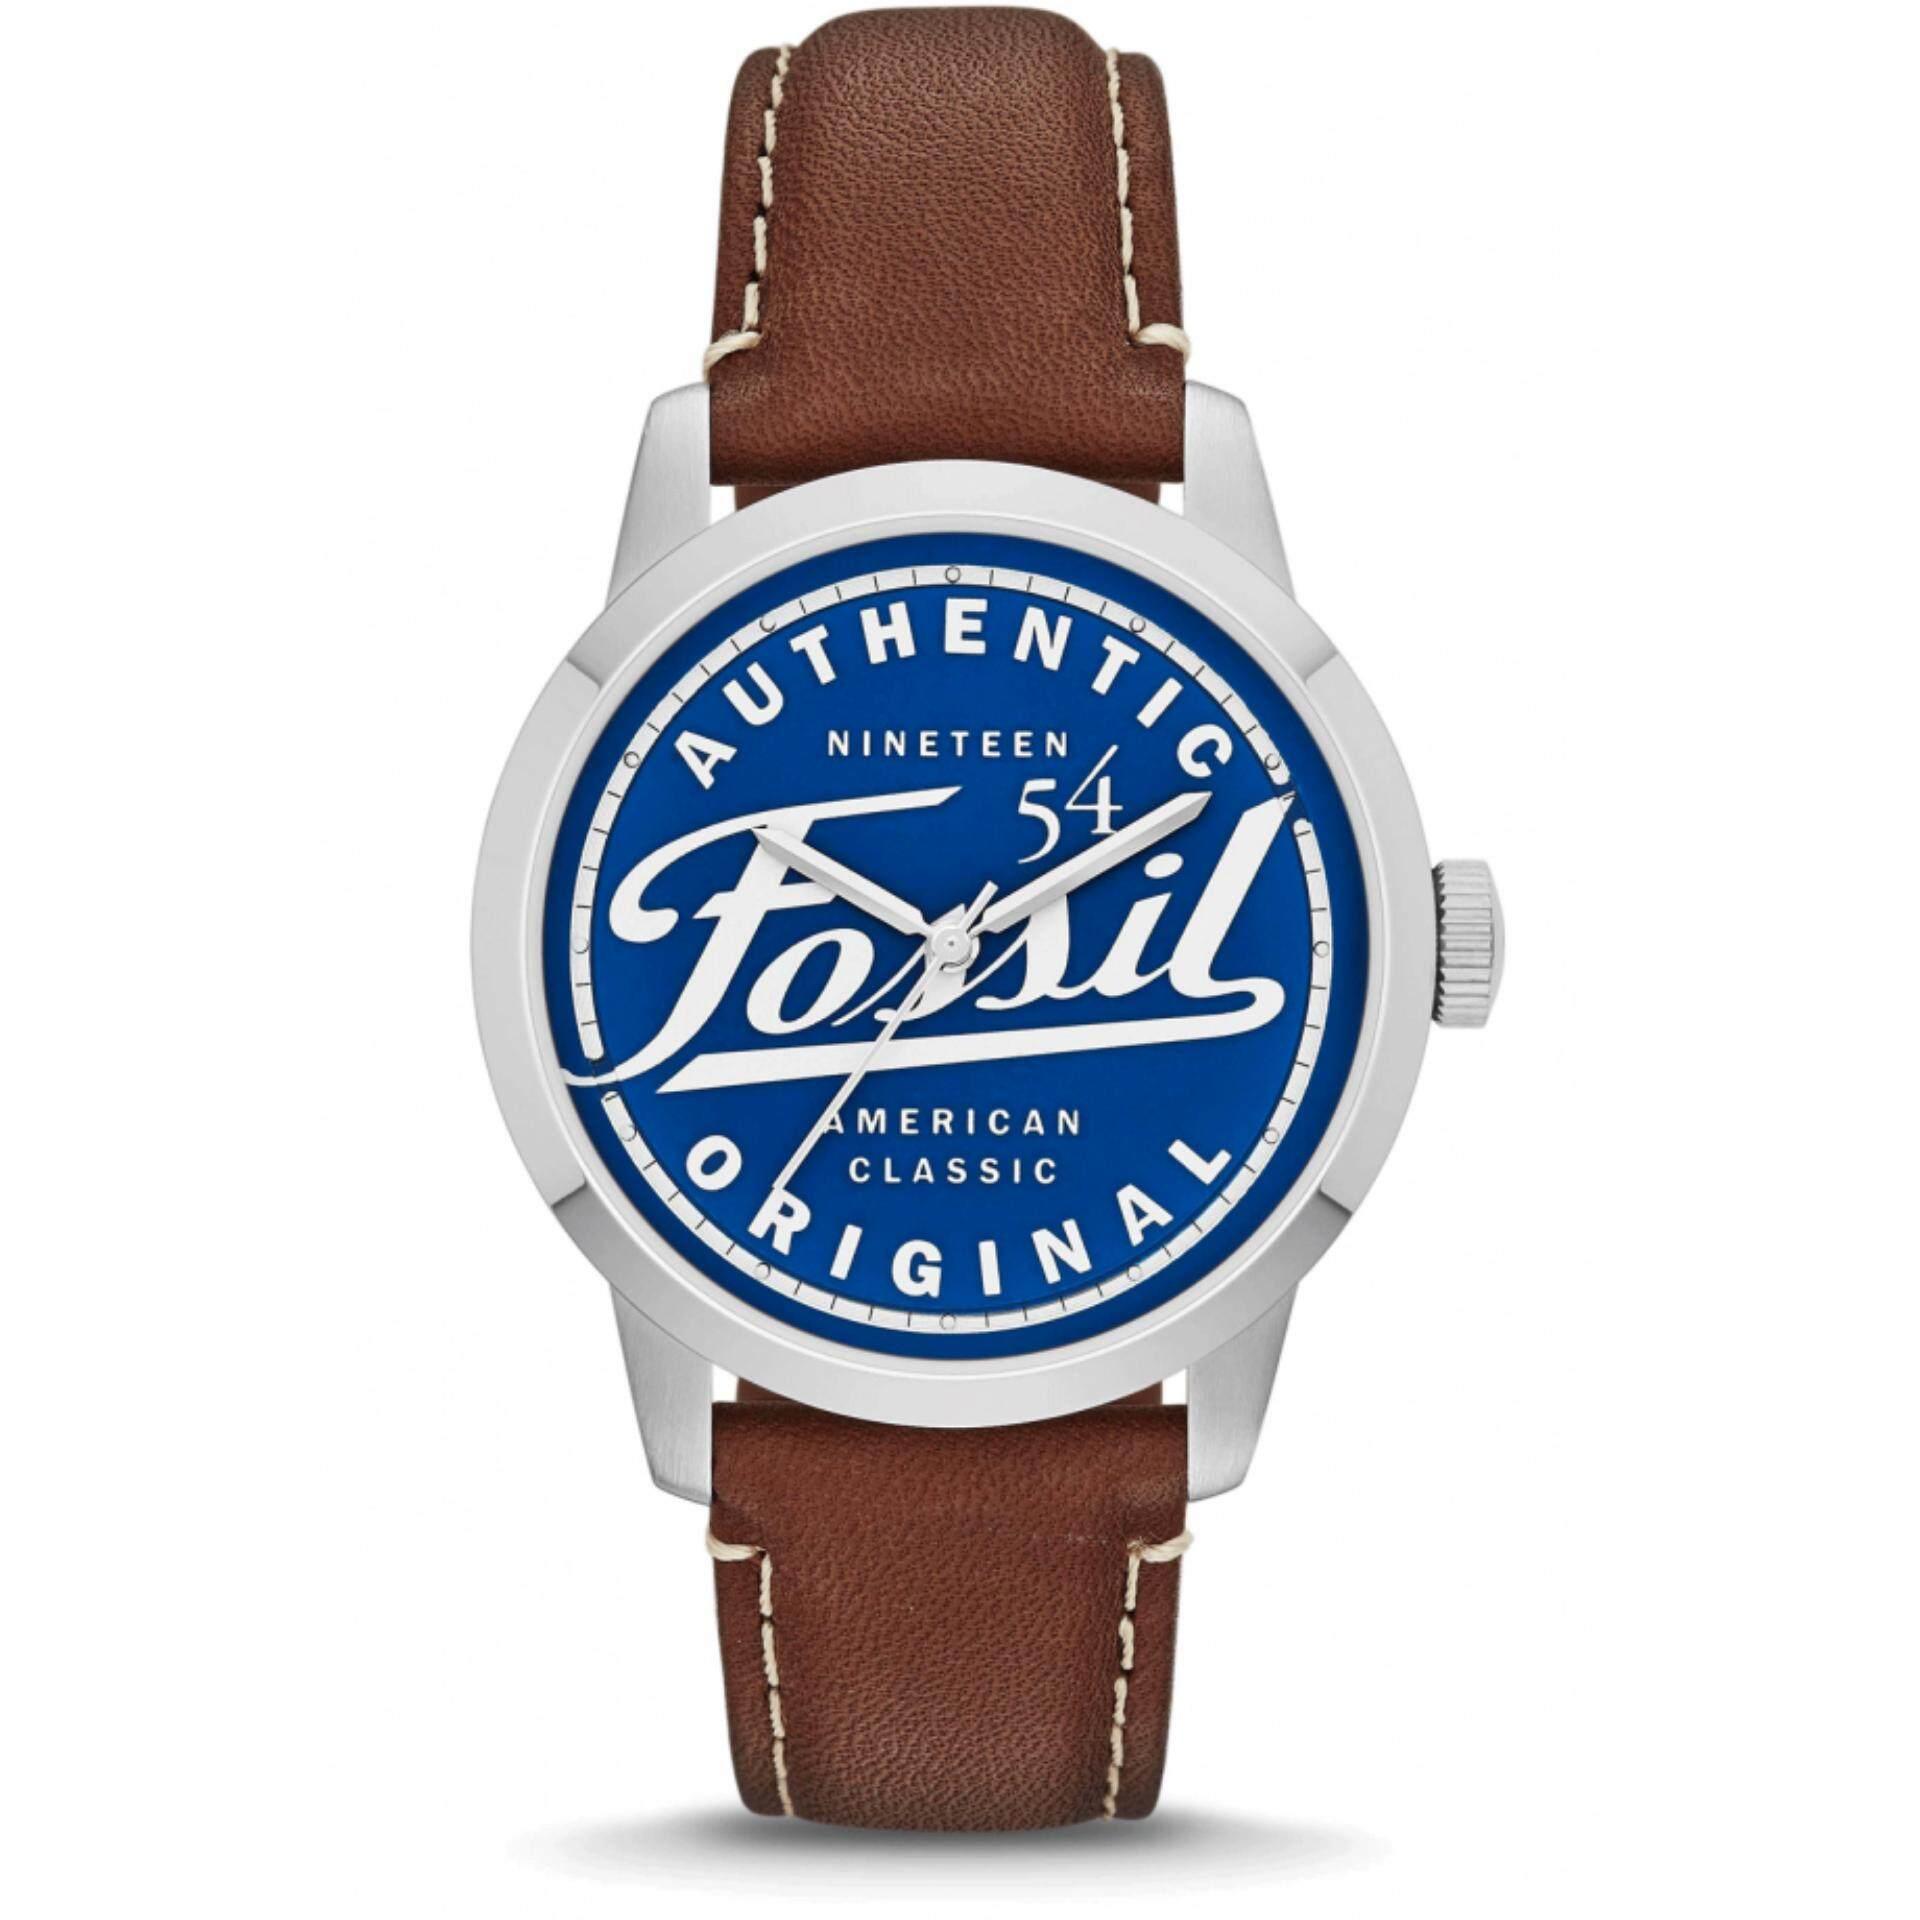 Fossil Fs4897 นาฬิกาข้อมือผู้ชาย สายหนัง สีน้ำตาล Special Edition 30Th Anniversary ไทย